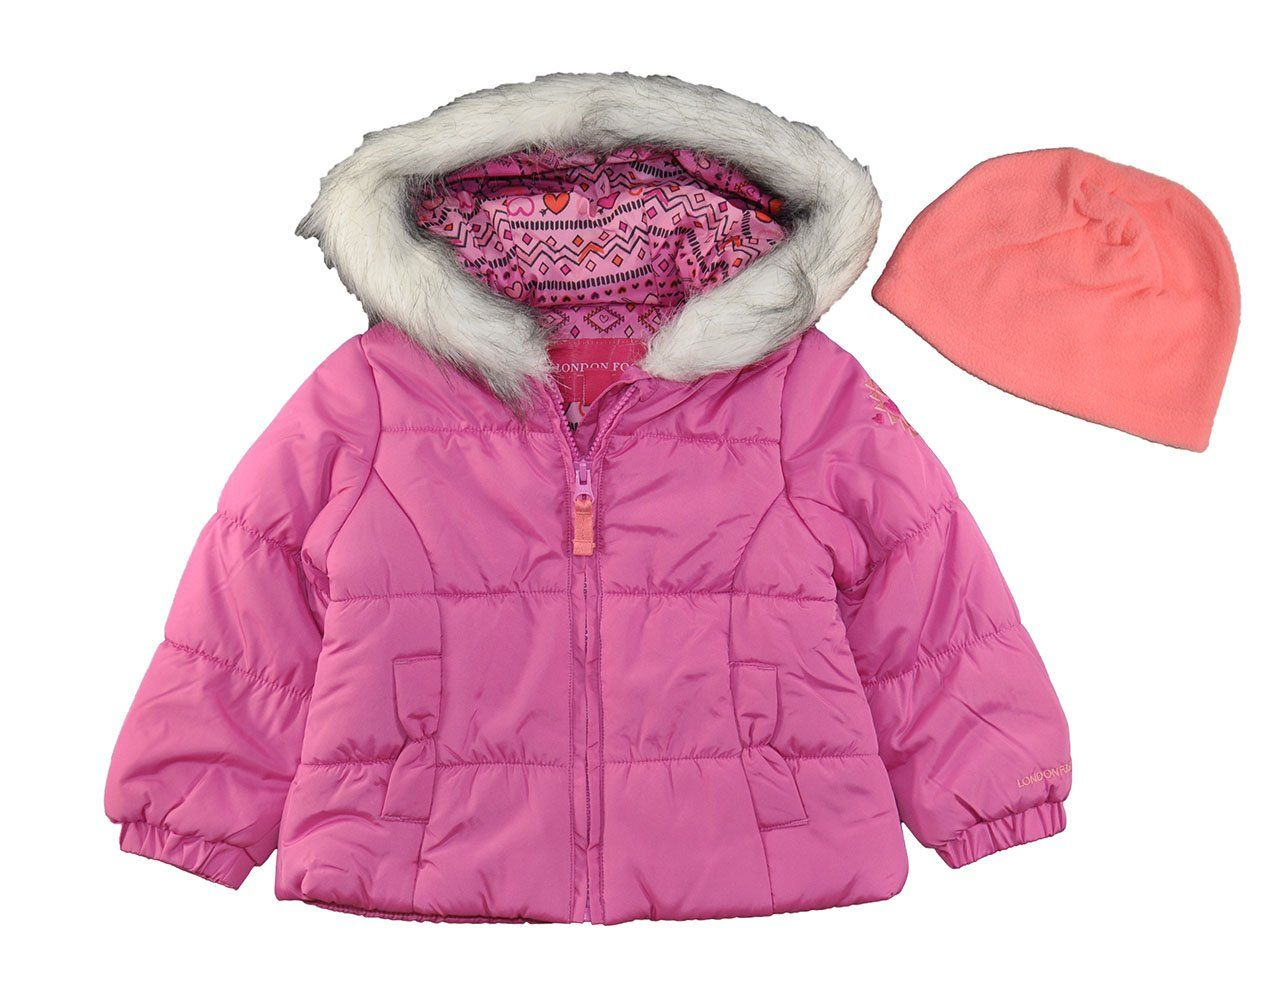 d8435b1fa London Fog Baby Girls and Little Girls Sweet Bow Puffer Jacket Coat ...